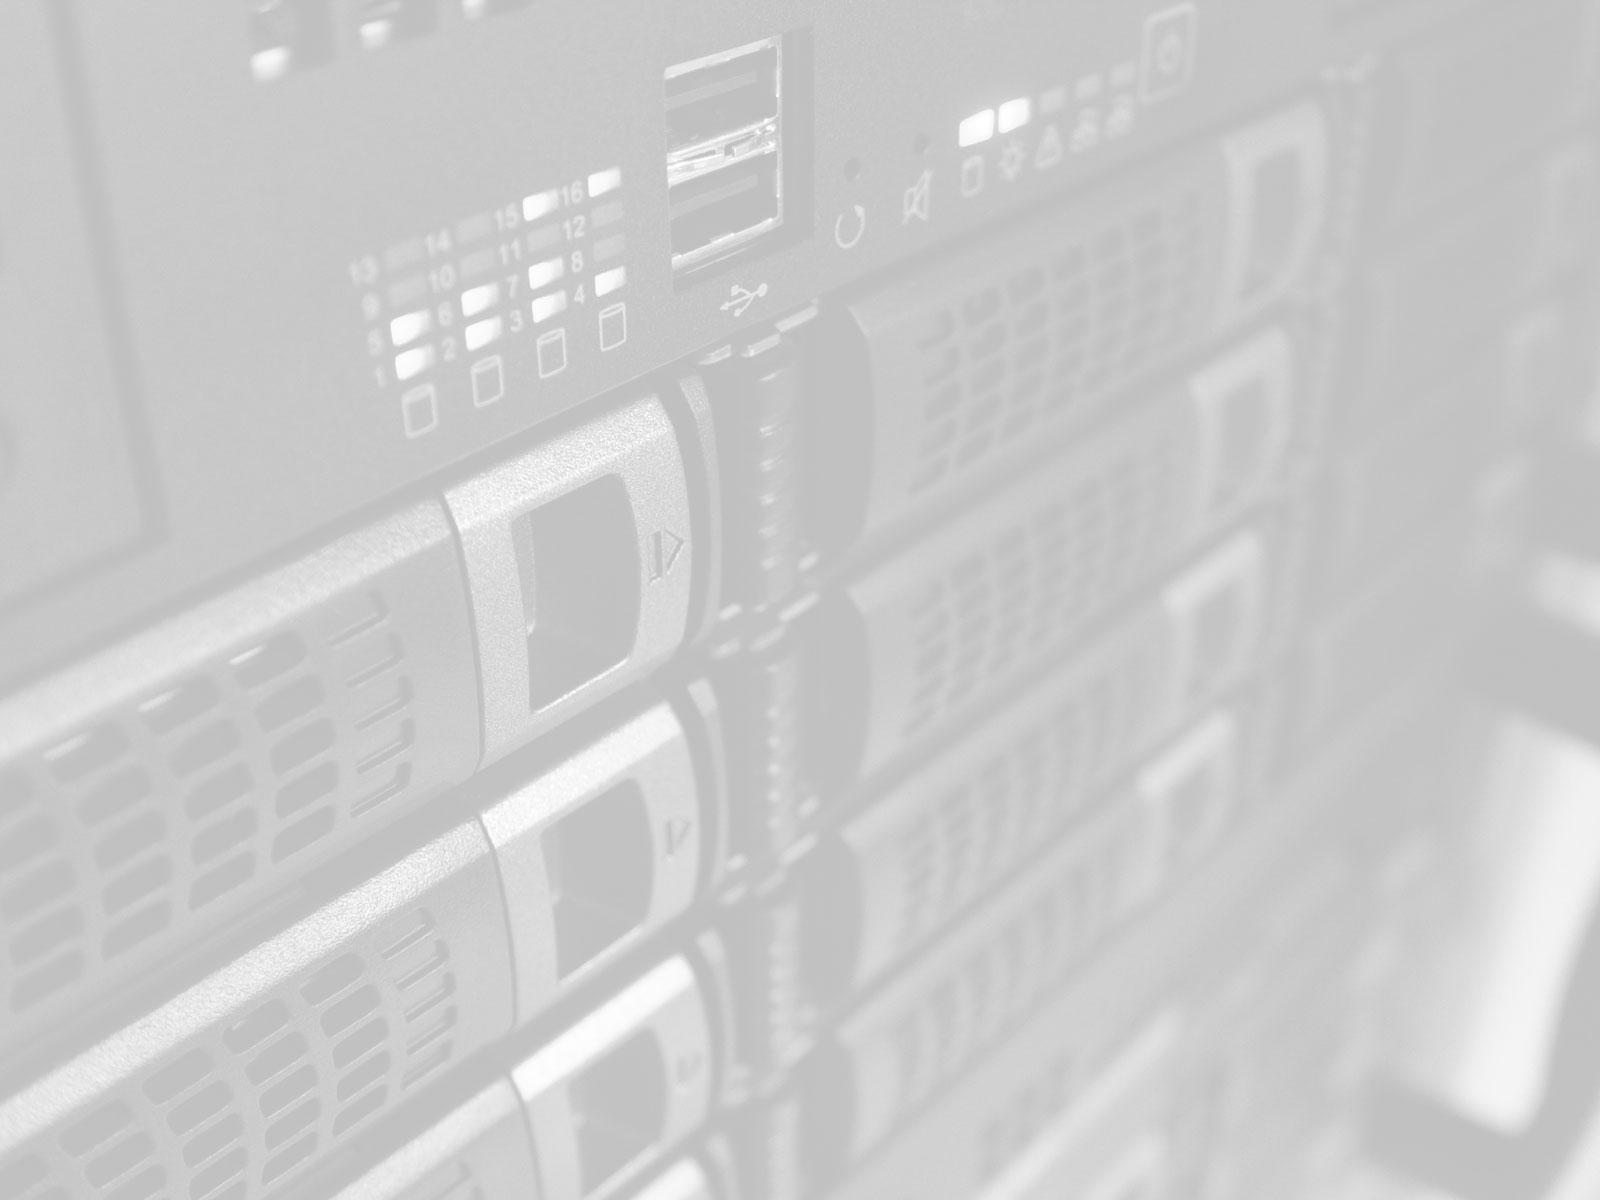 bg-rack-server